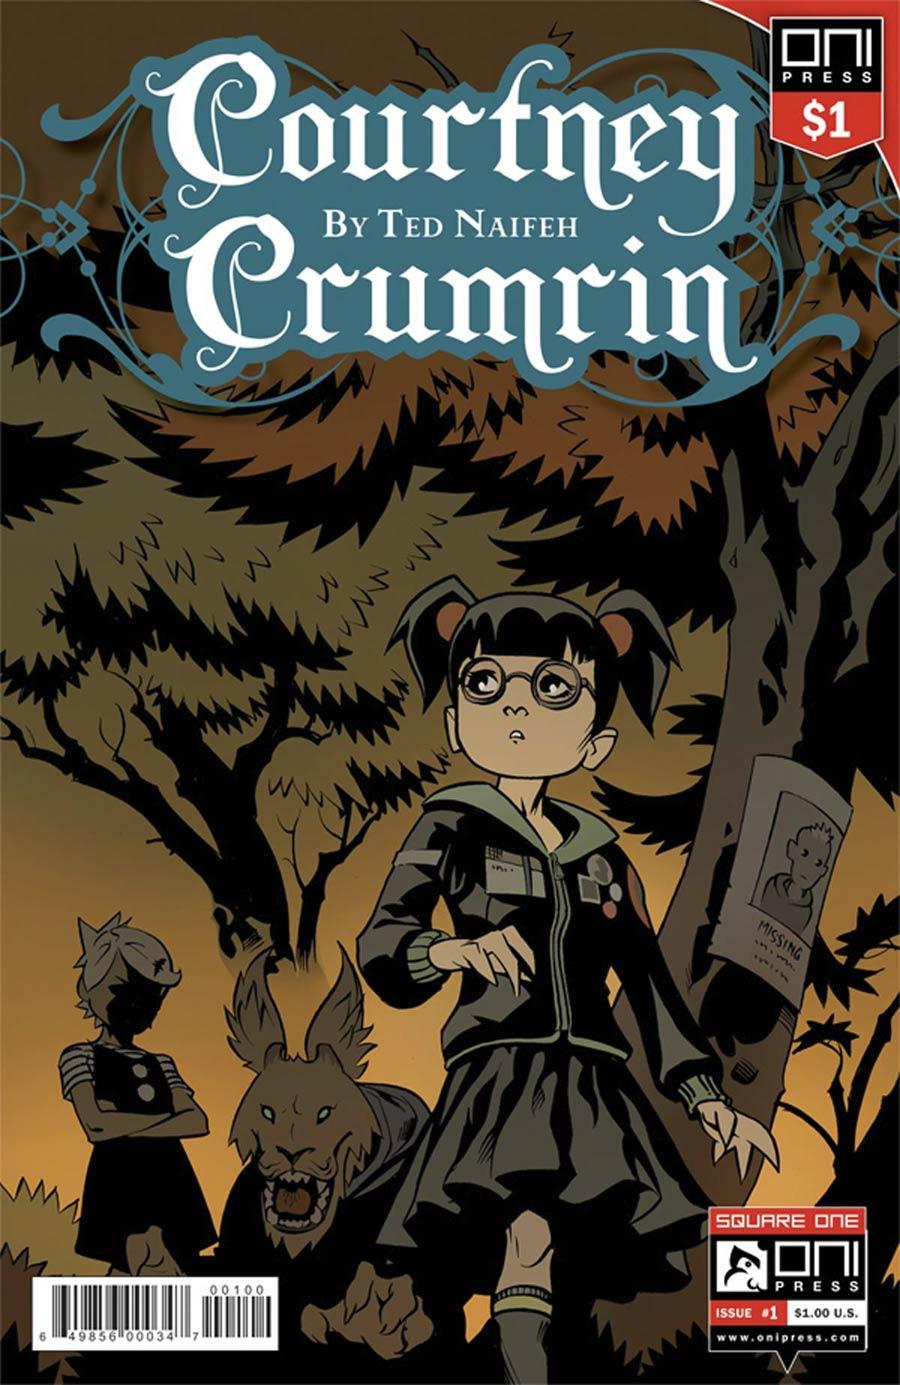 Courtney Crumrin #1 Cover B 1 Dollar Edition